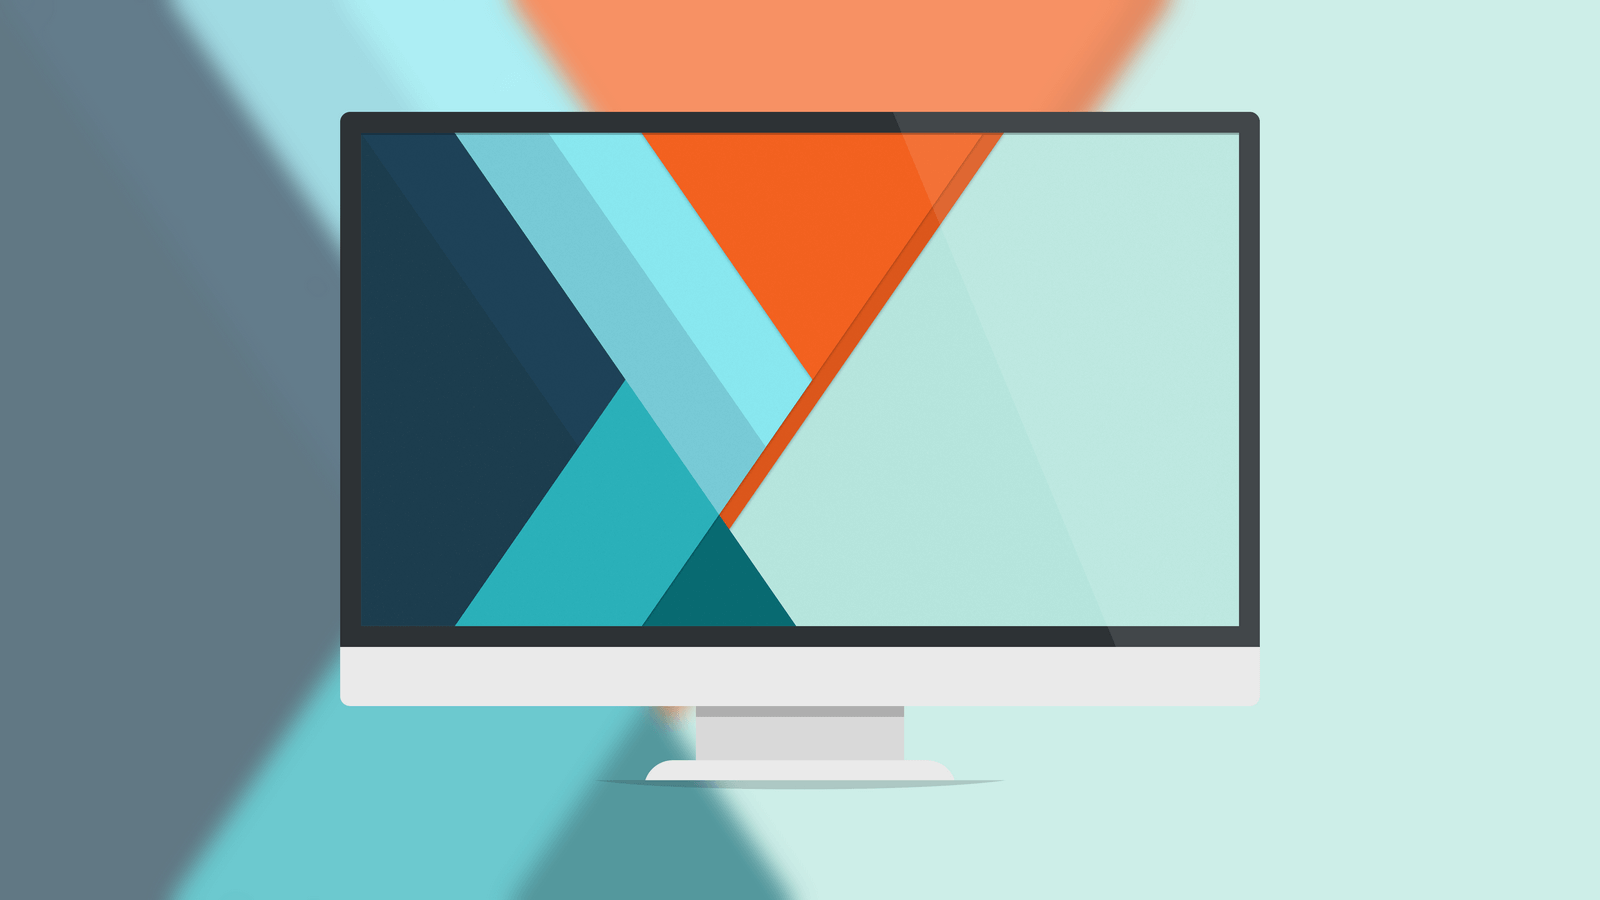 material__2_wallpaper_4k_by_puscifer91-d8dmr1n